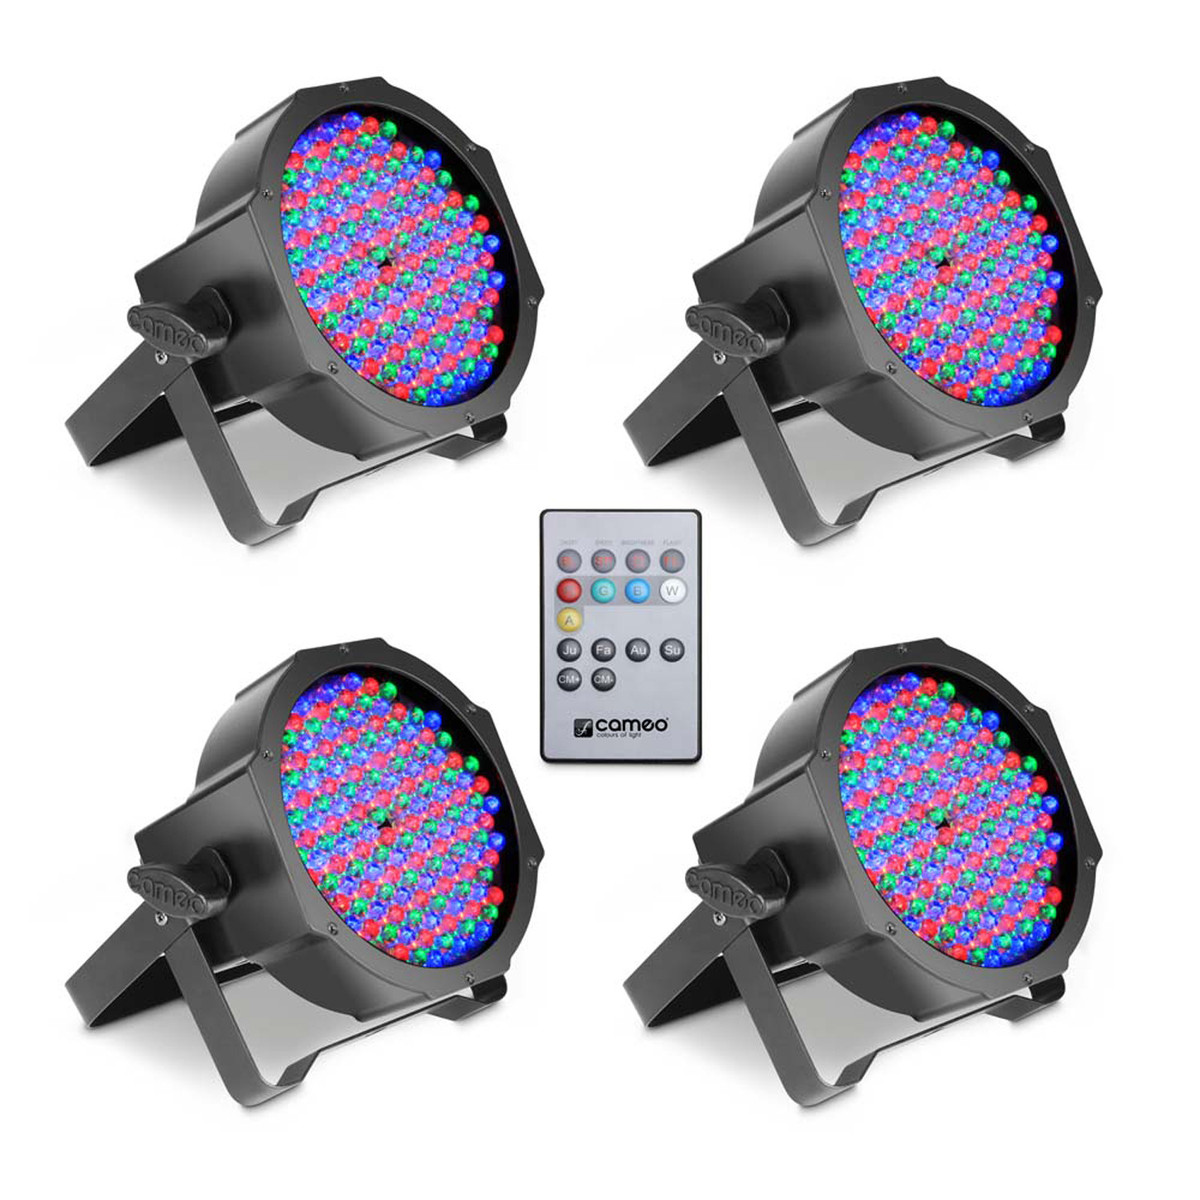 Image of Cameo 144 x 10mm RGB LED Flat Par Can Spotlight Black Set of 4